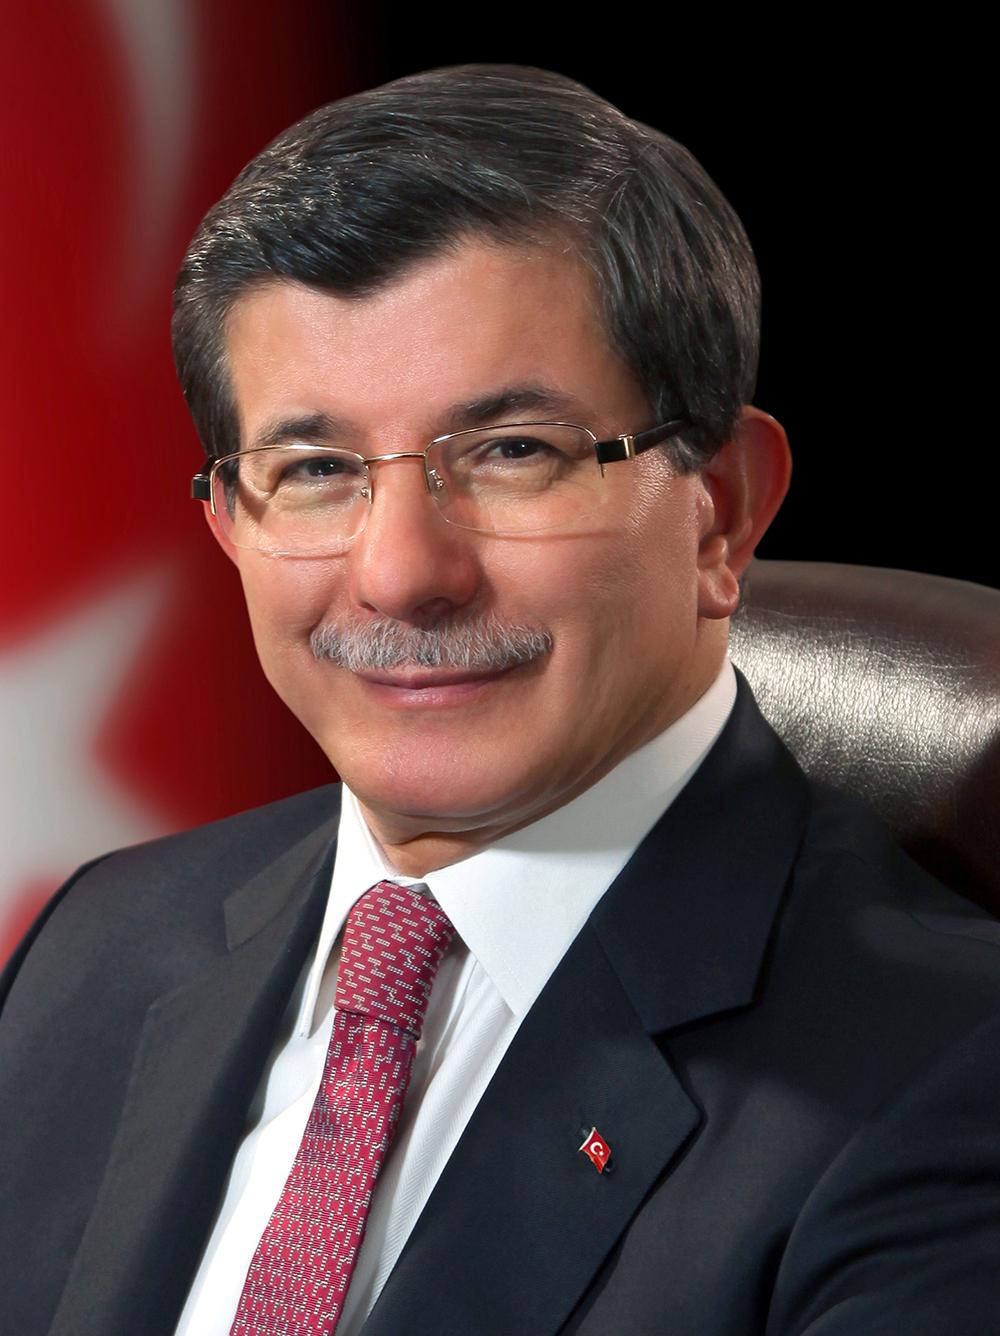 Newly resigned Turkish Prime Minister Ahmet Davutoglu. Credit: Wikimedia Commons.